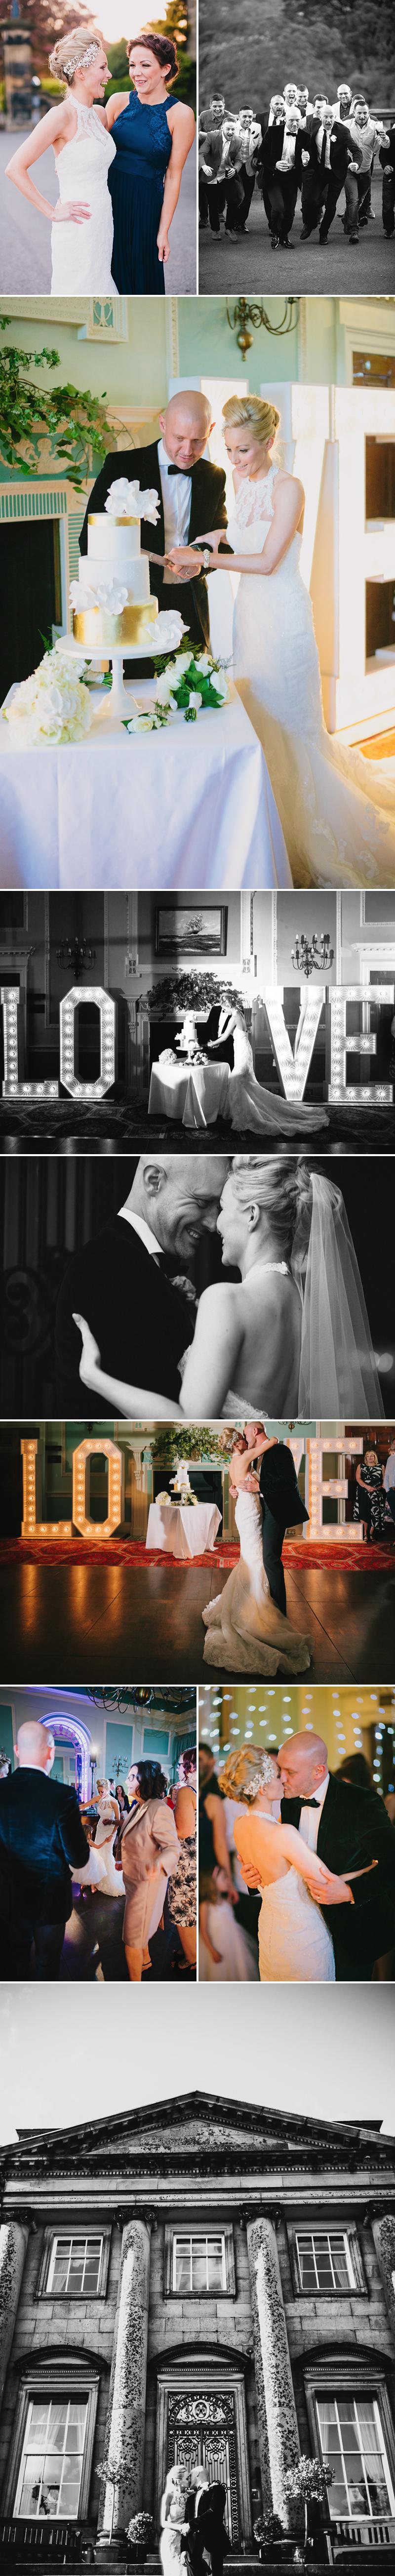 wedding-venues-in-yorkshire-denton-hall-wedding-photography-005